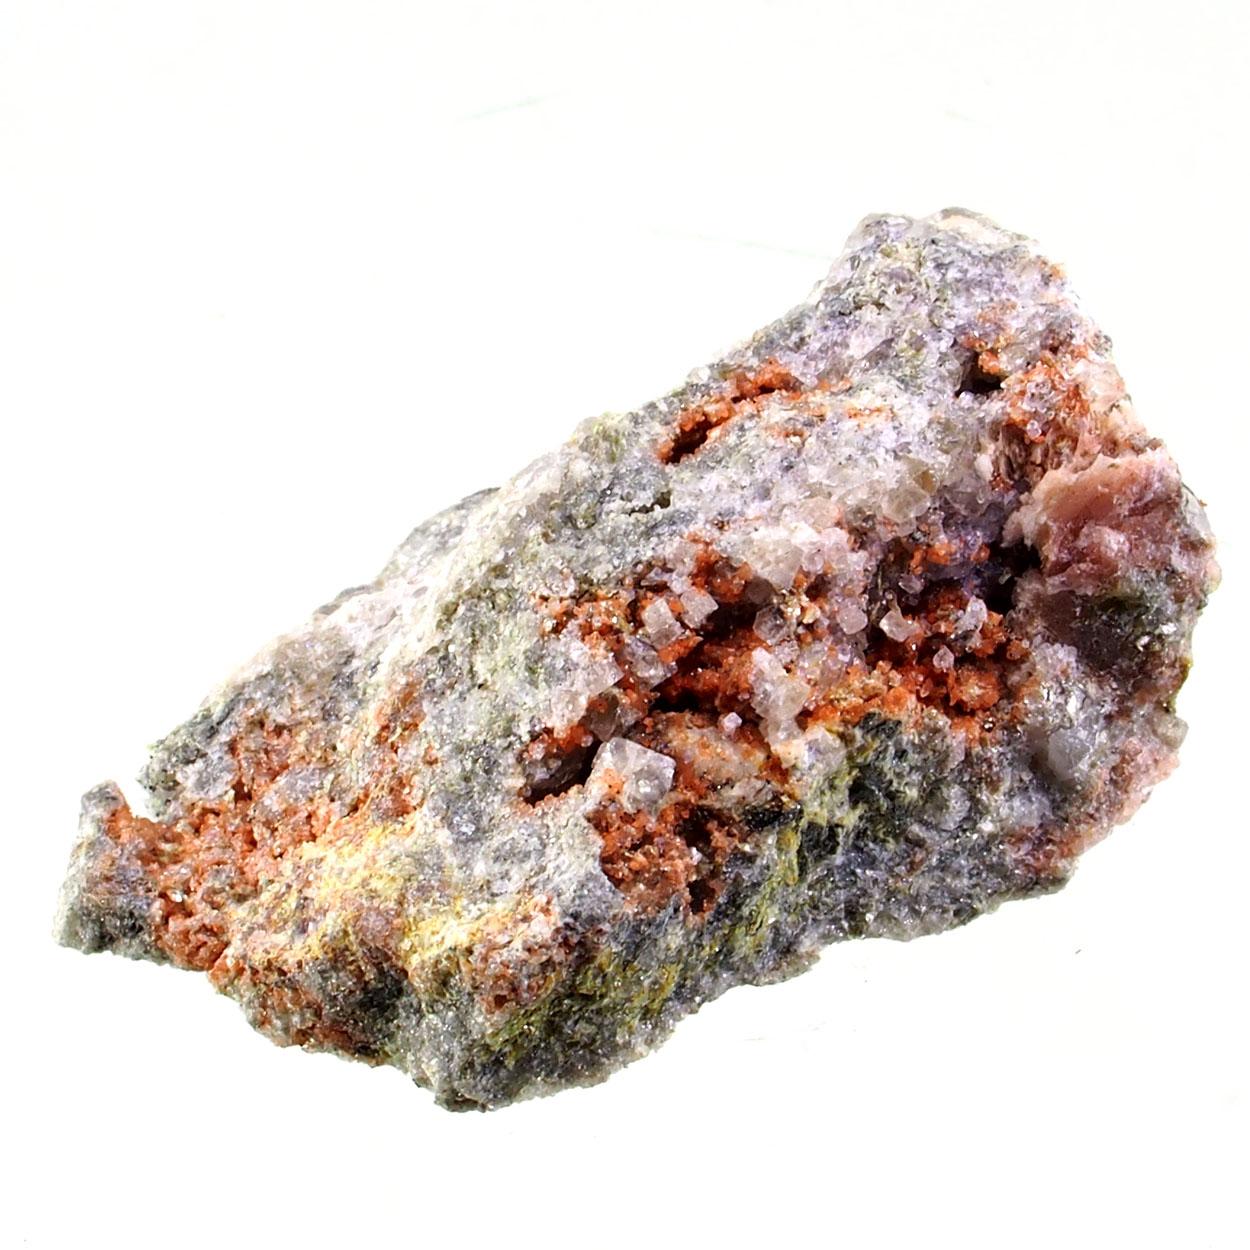 Argentopyrite & Rammelsbergite